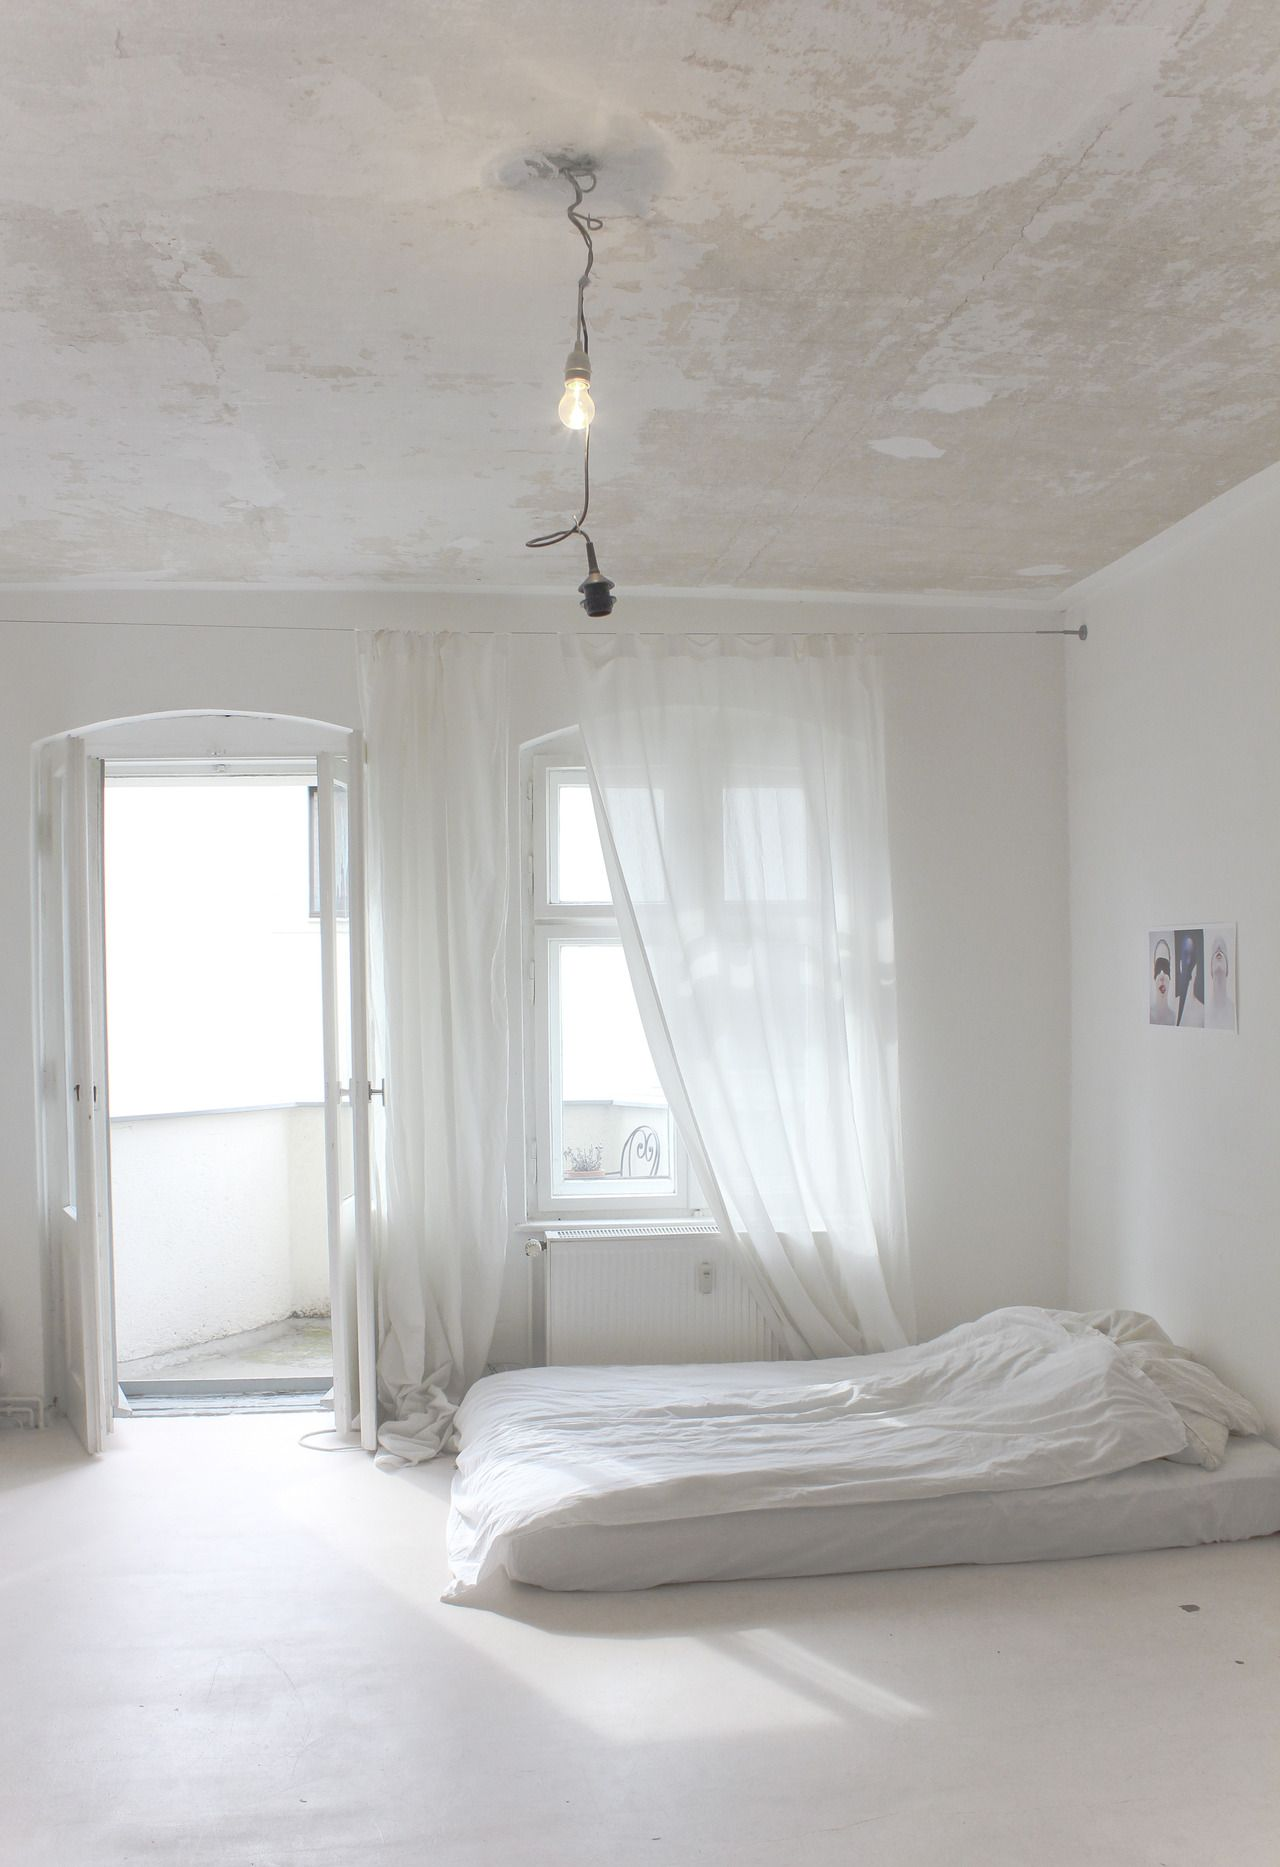 blanc, lumière, futon